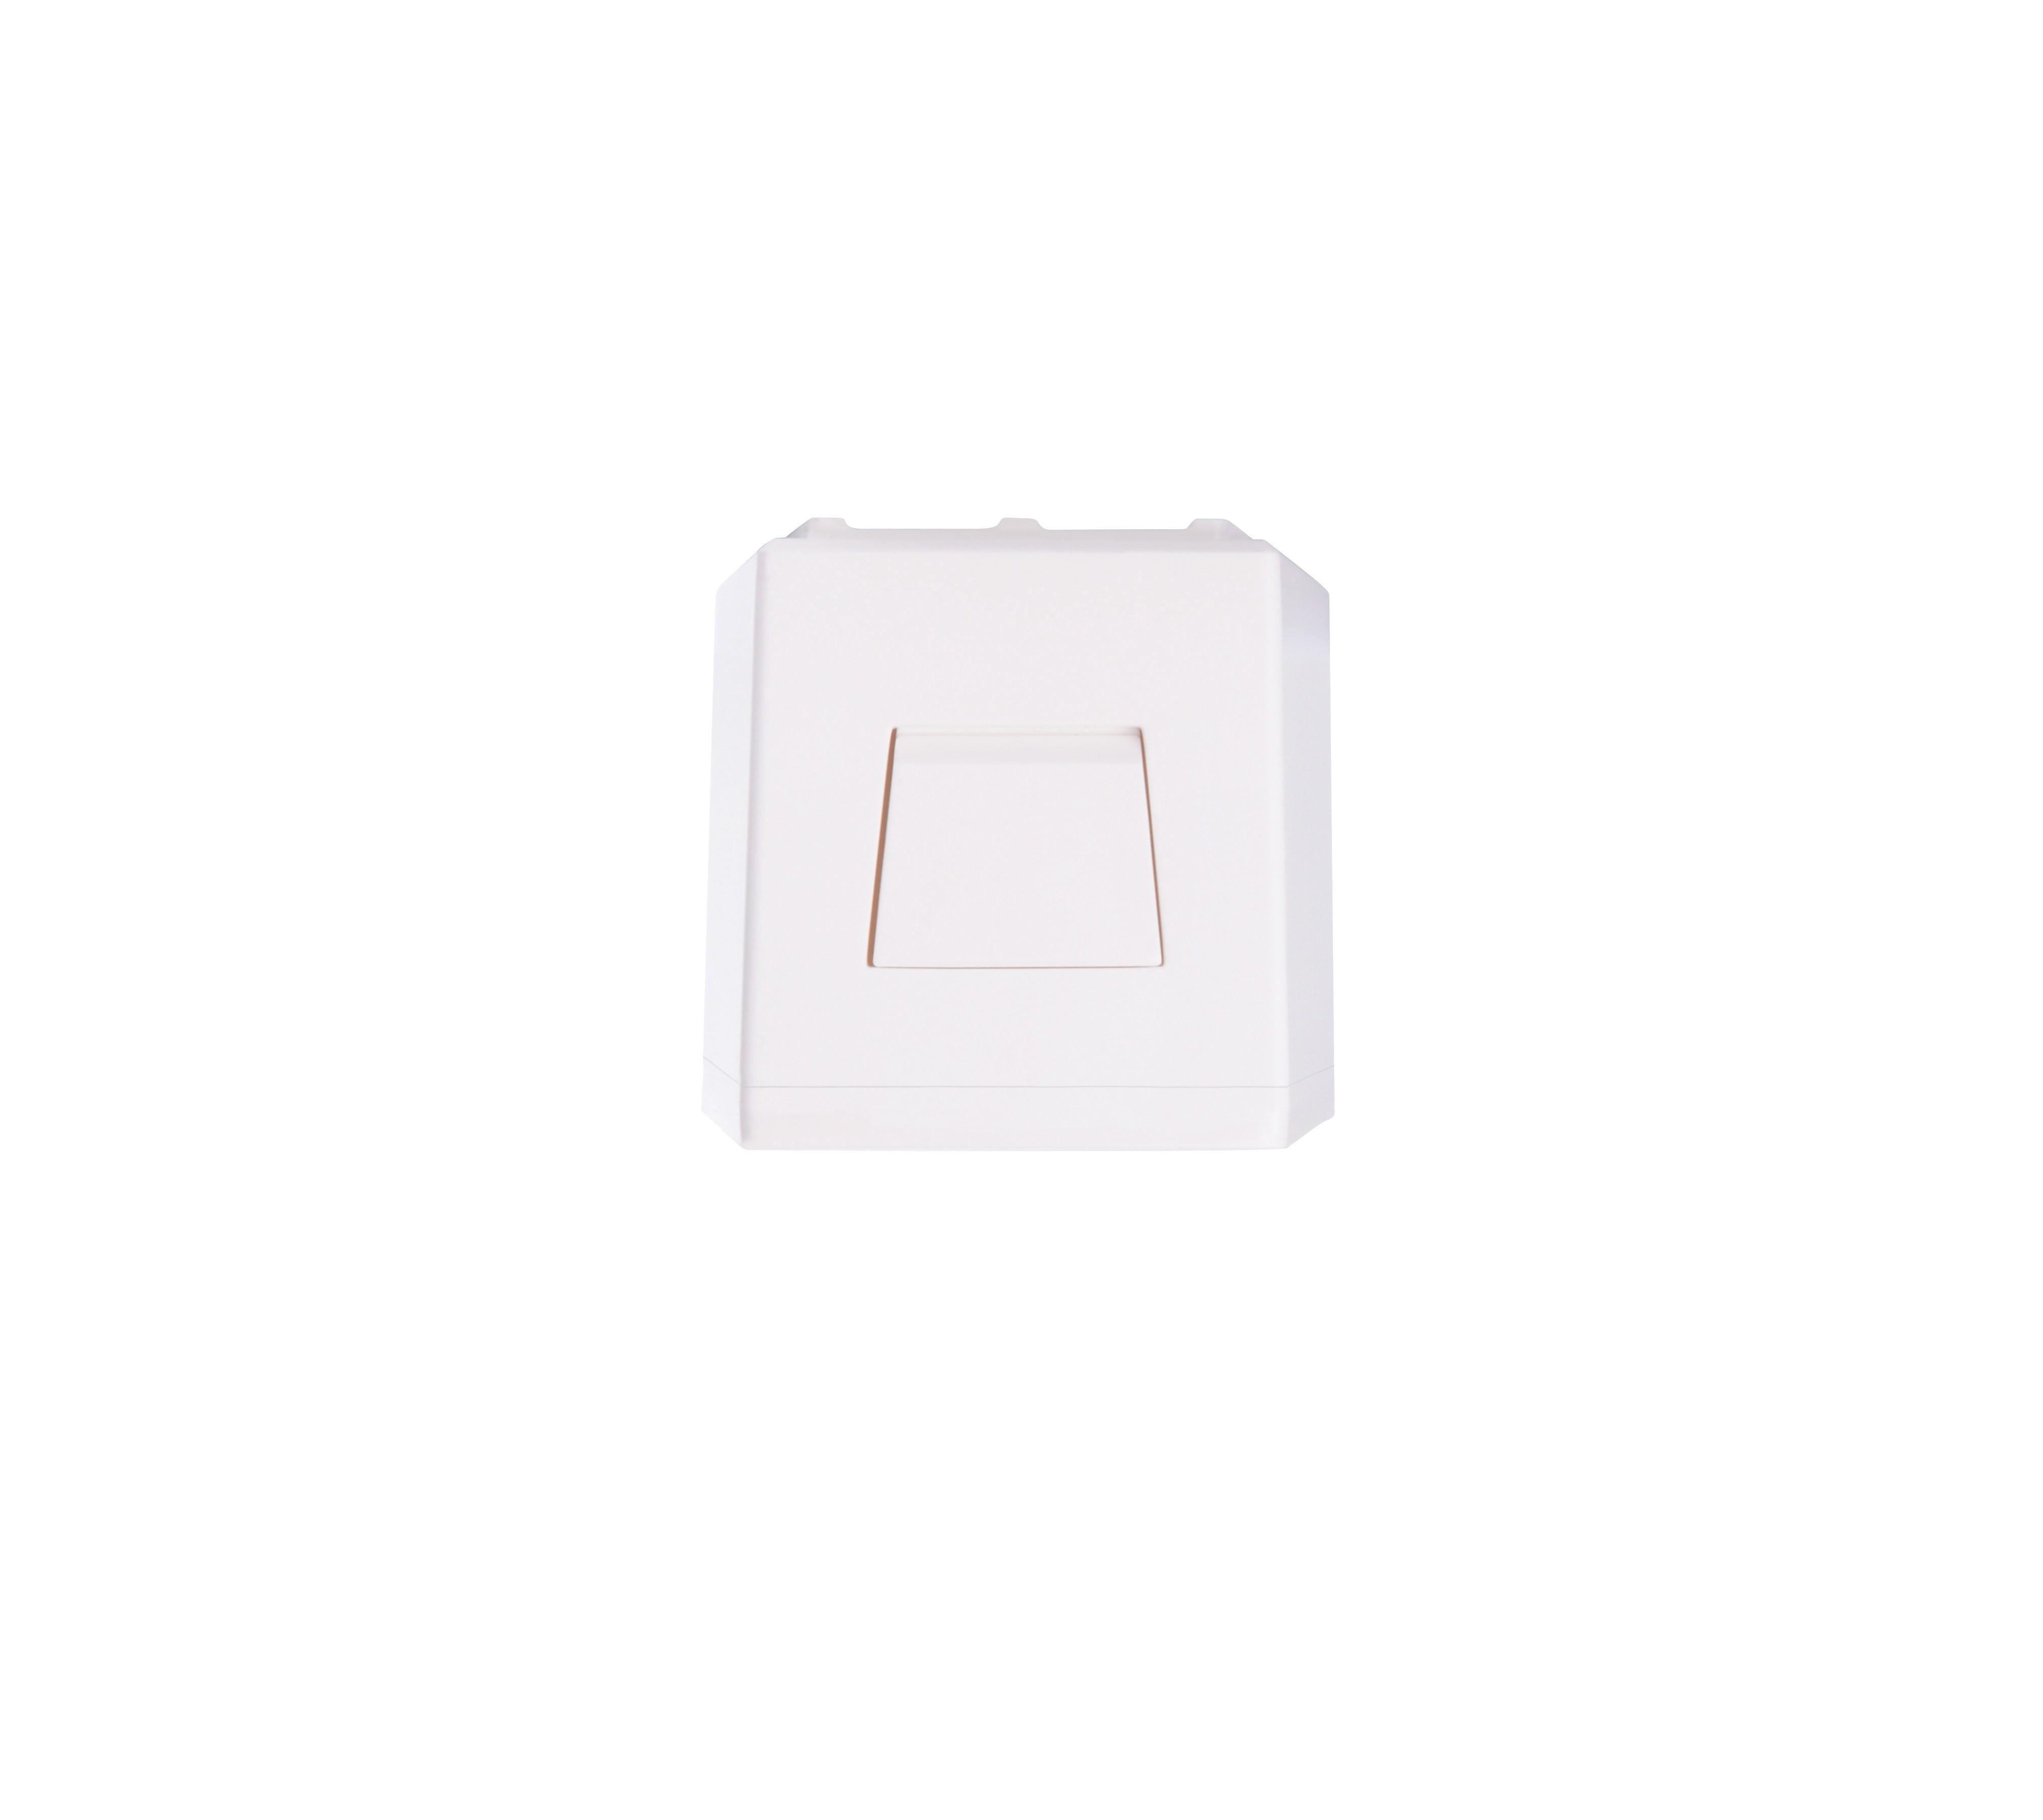 Lampa emergenta led Intelight 94767   3h nementinut test automat1